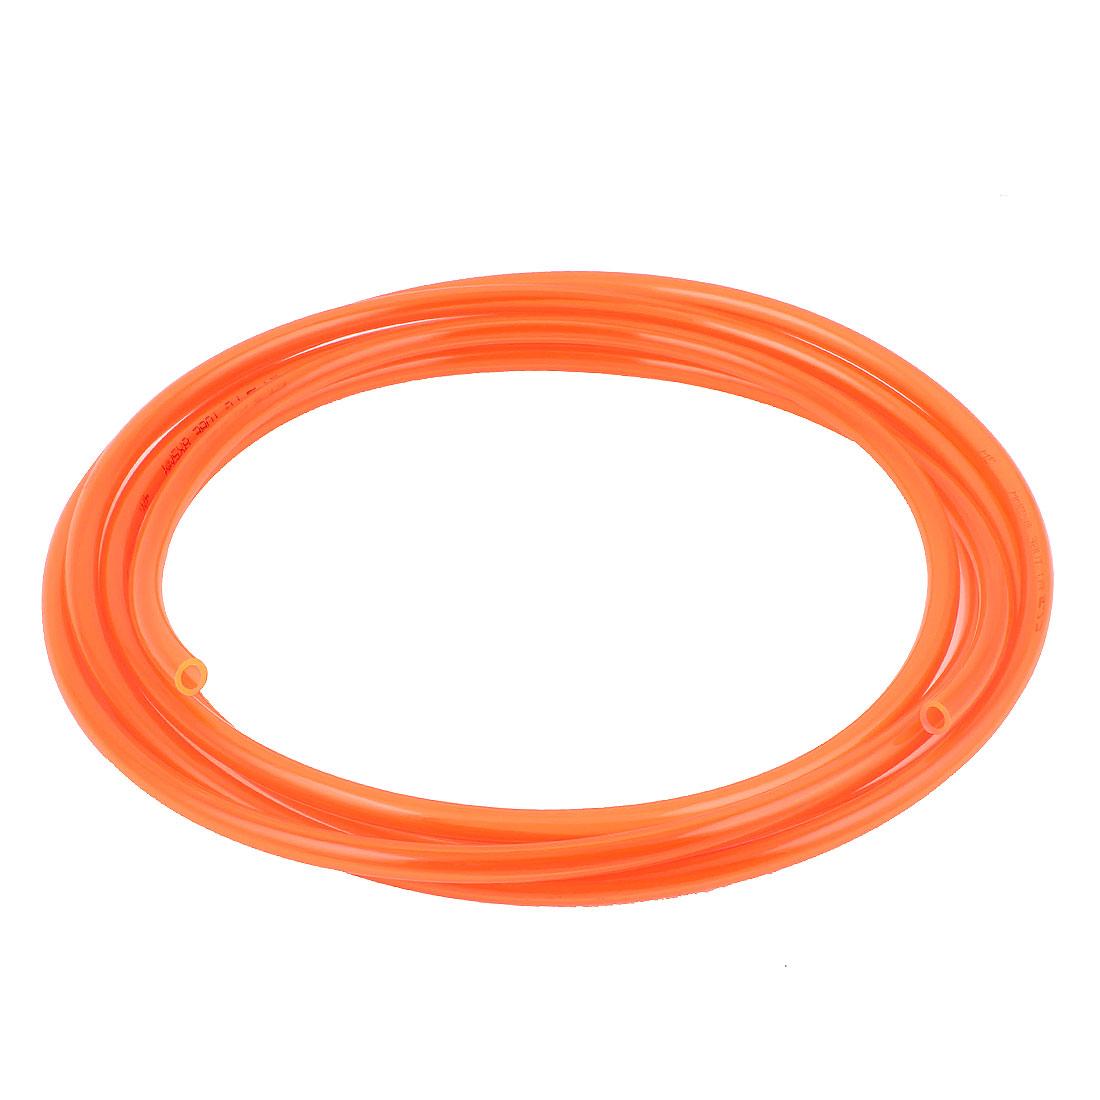 8mm x 5mm Pneumatic Air Compressor Tubing PU Hose Tube Pipe 3 meter Orange